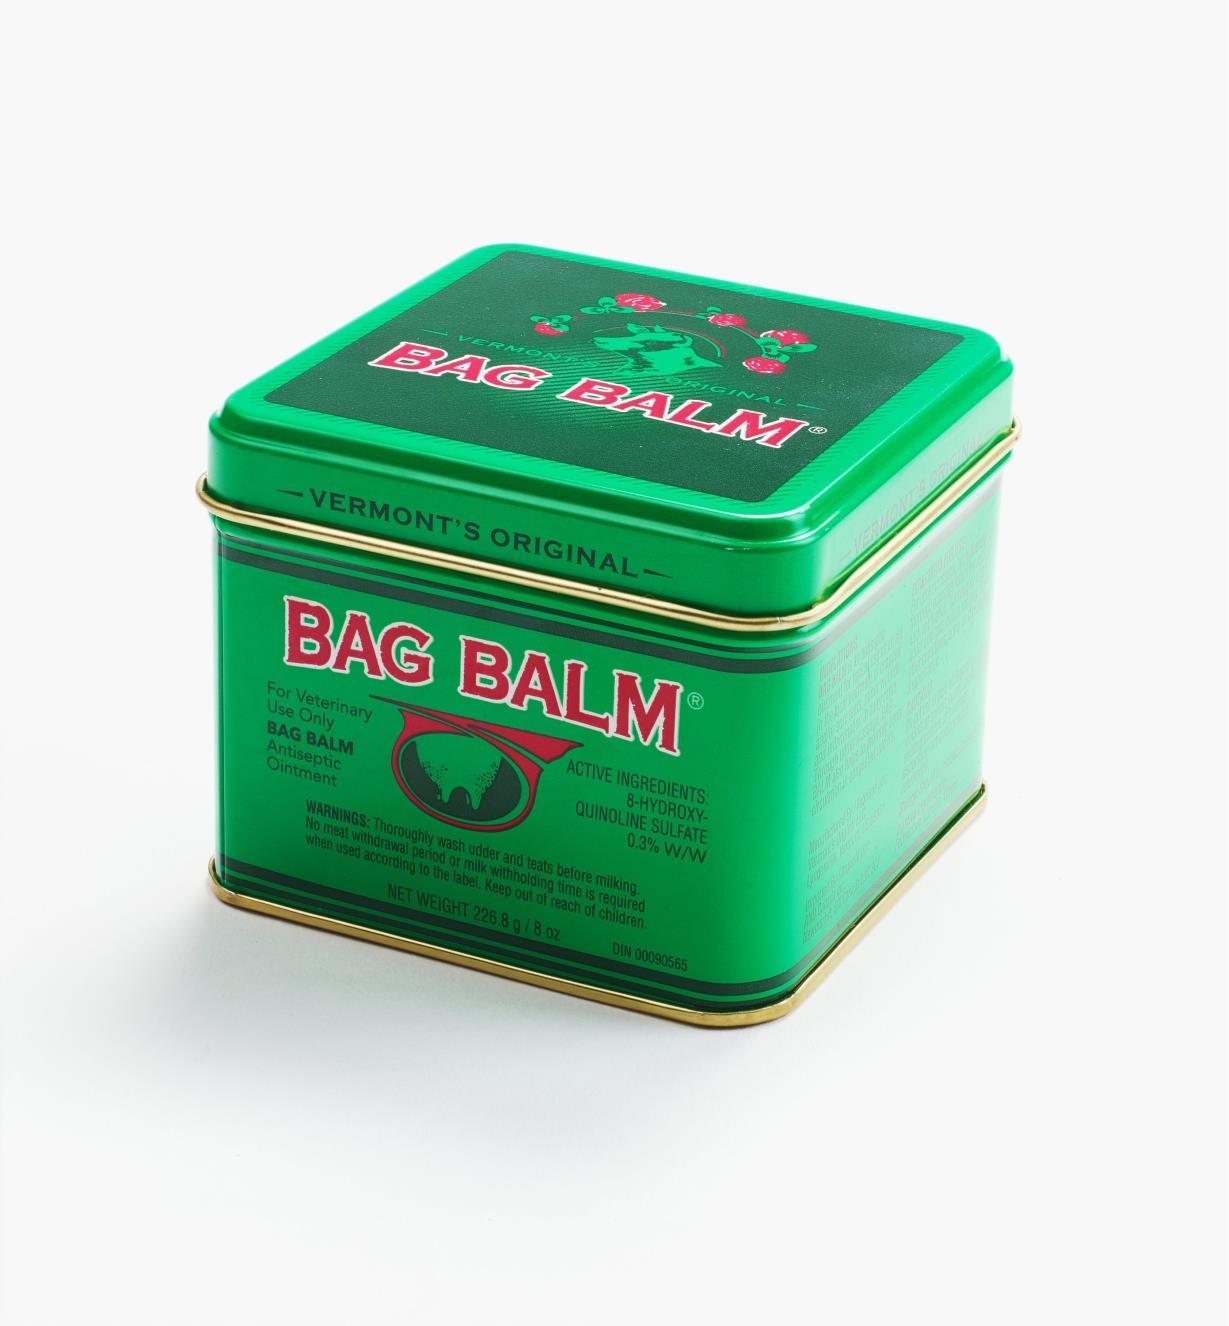 AB705 - Bag Balm, 8oz